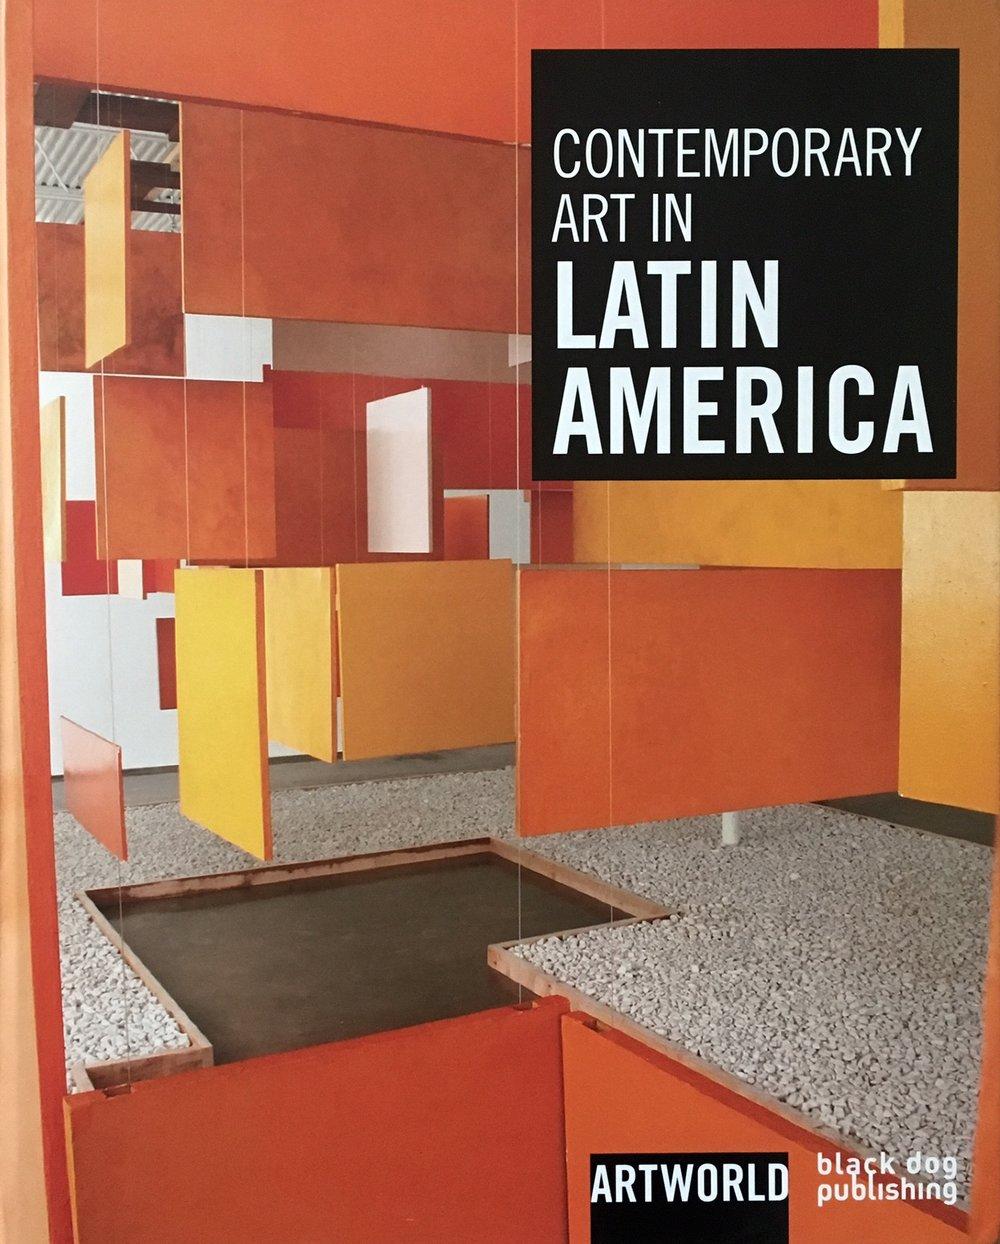 Contemporary Art in Latin America   Black Dog Publishing   ISBN: 978-1-906155-64-3